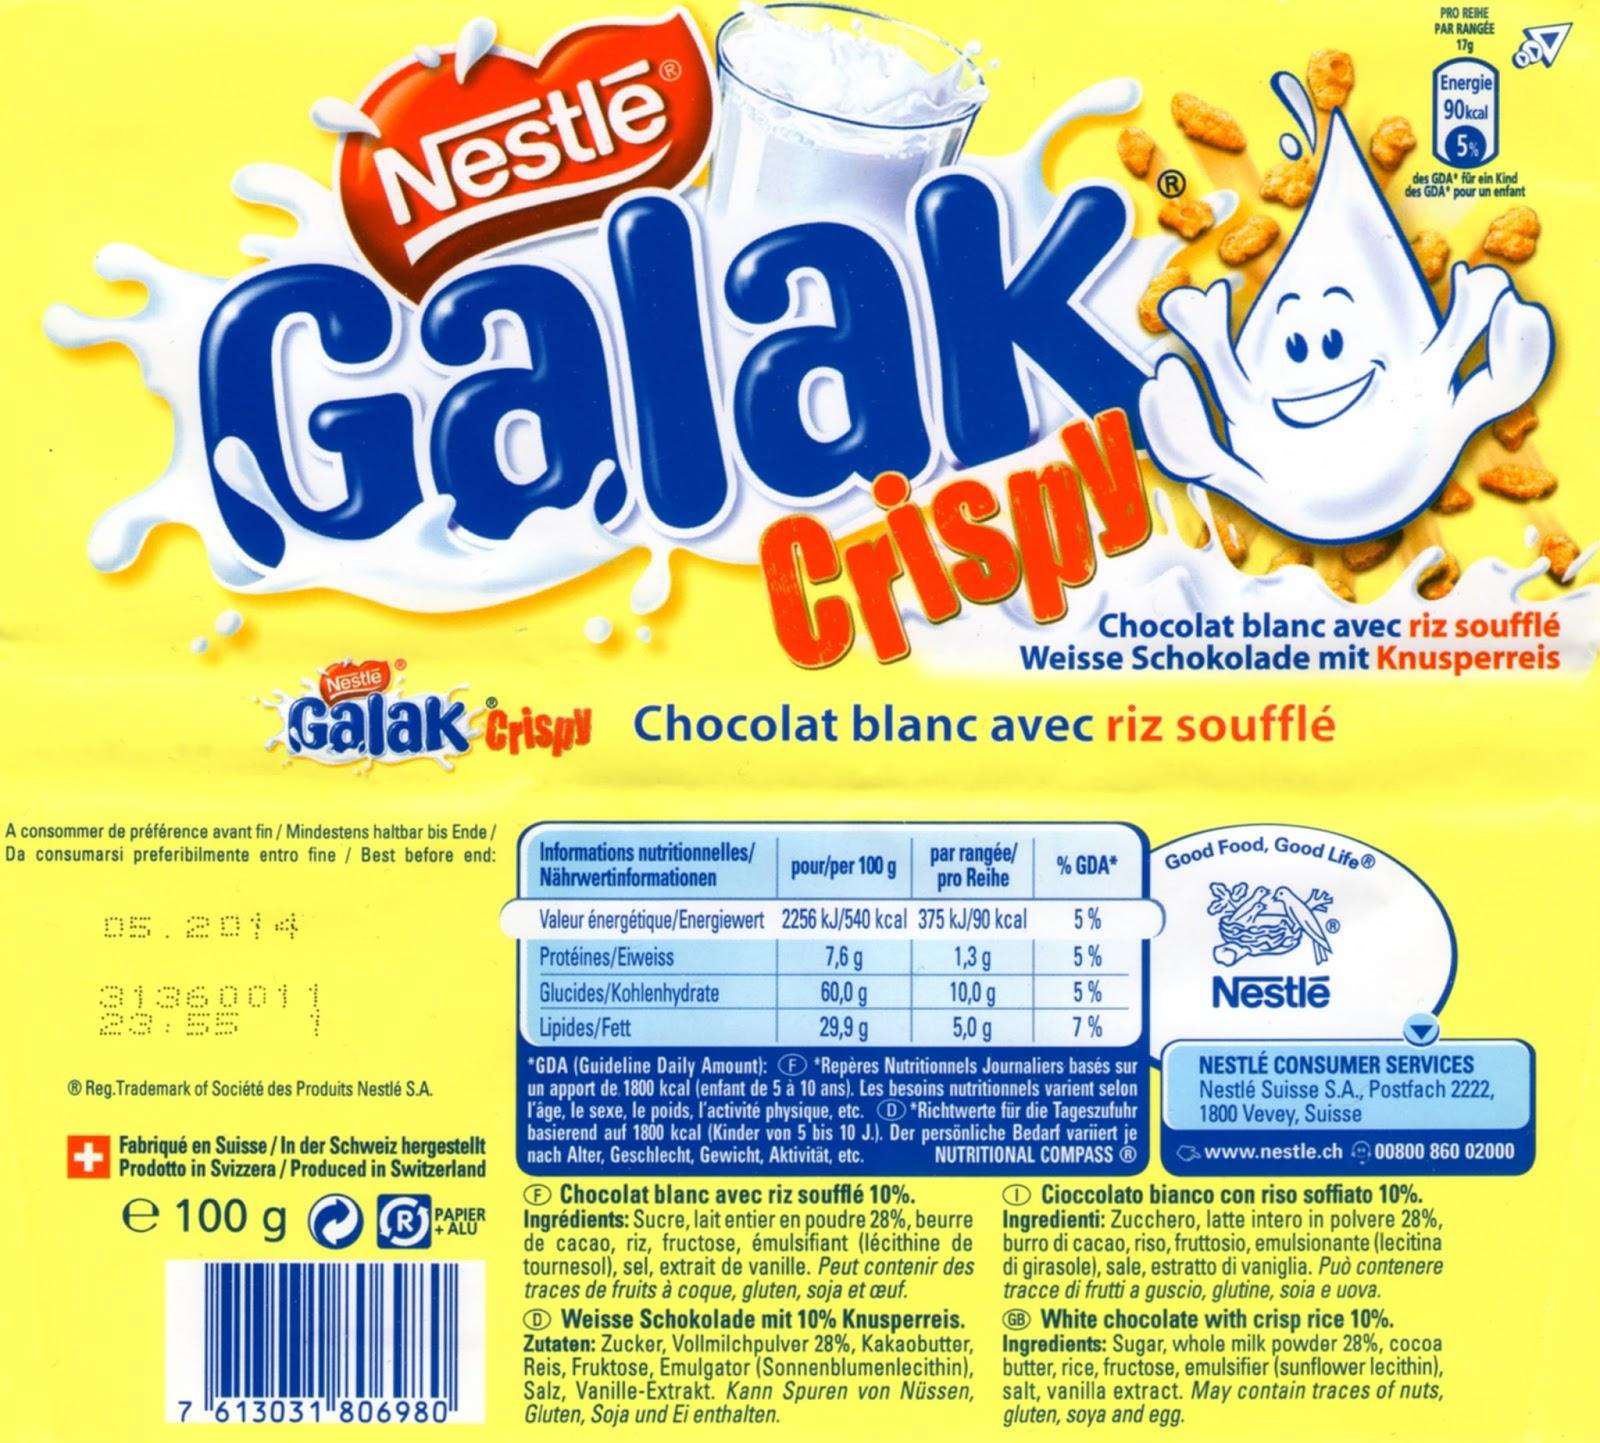 tablette de chocolat blanc gourmand nestlé galak crispy